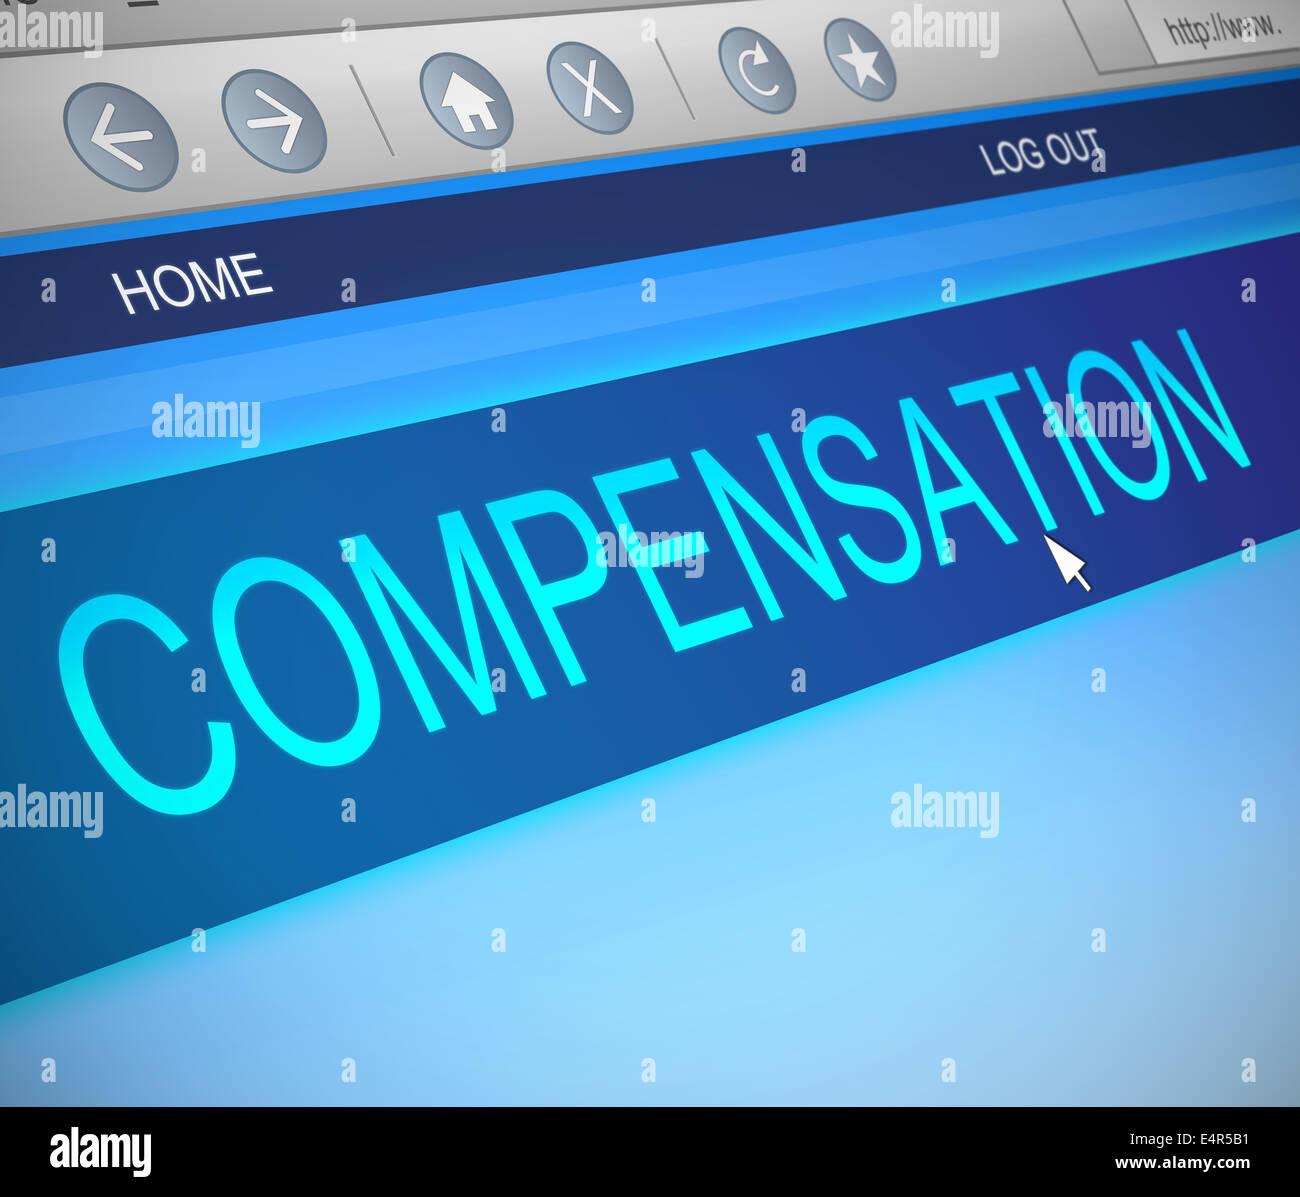 Compensation concept. - Stock Image